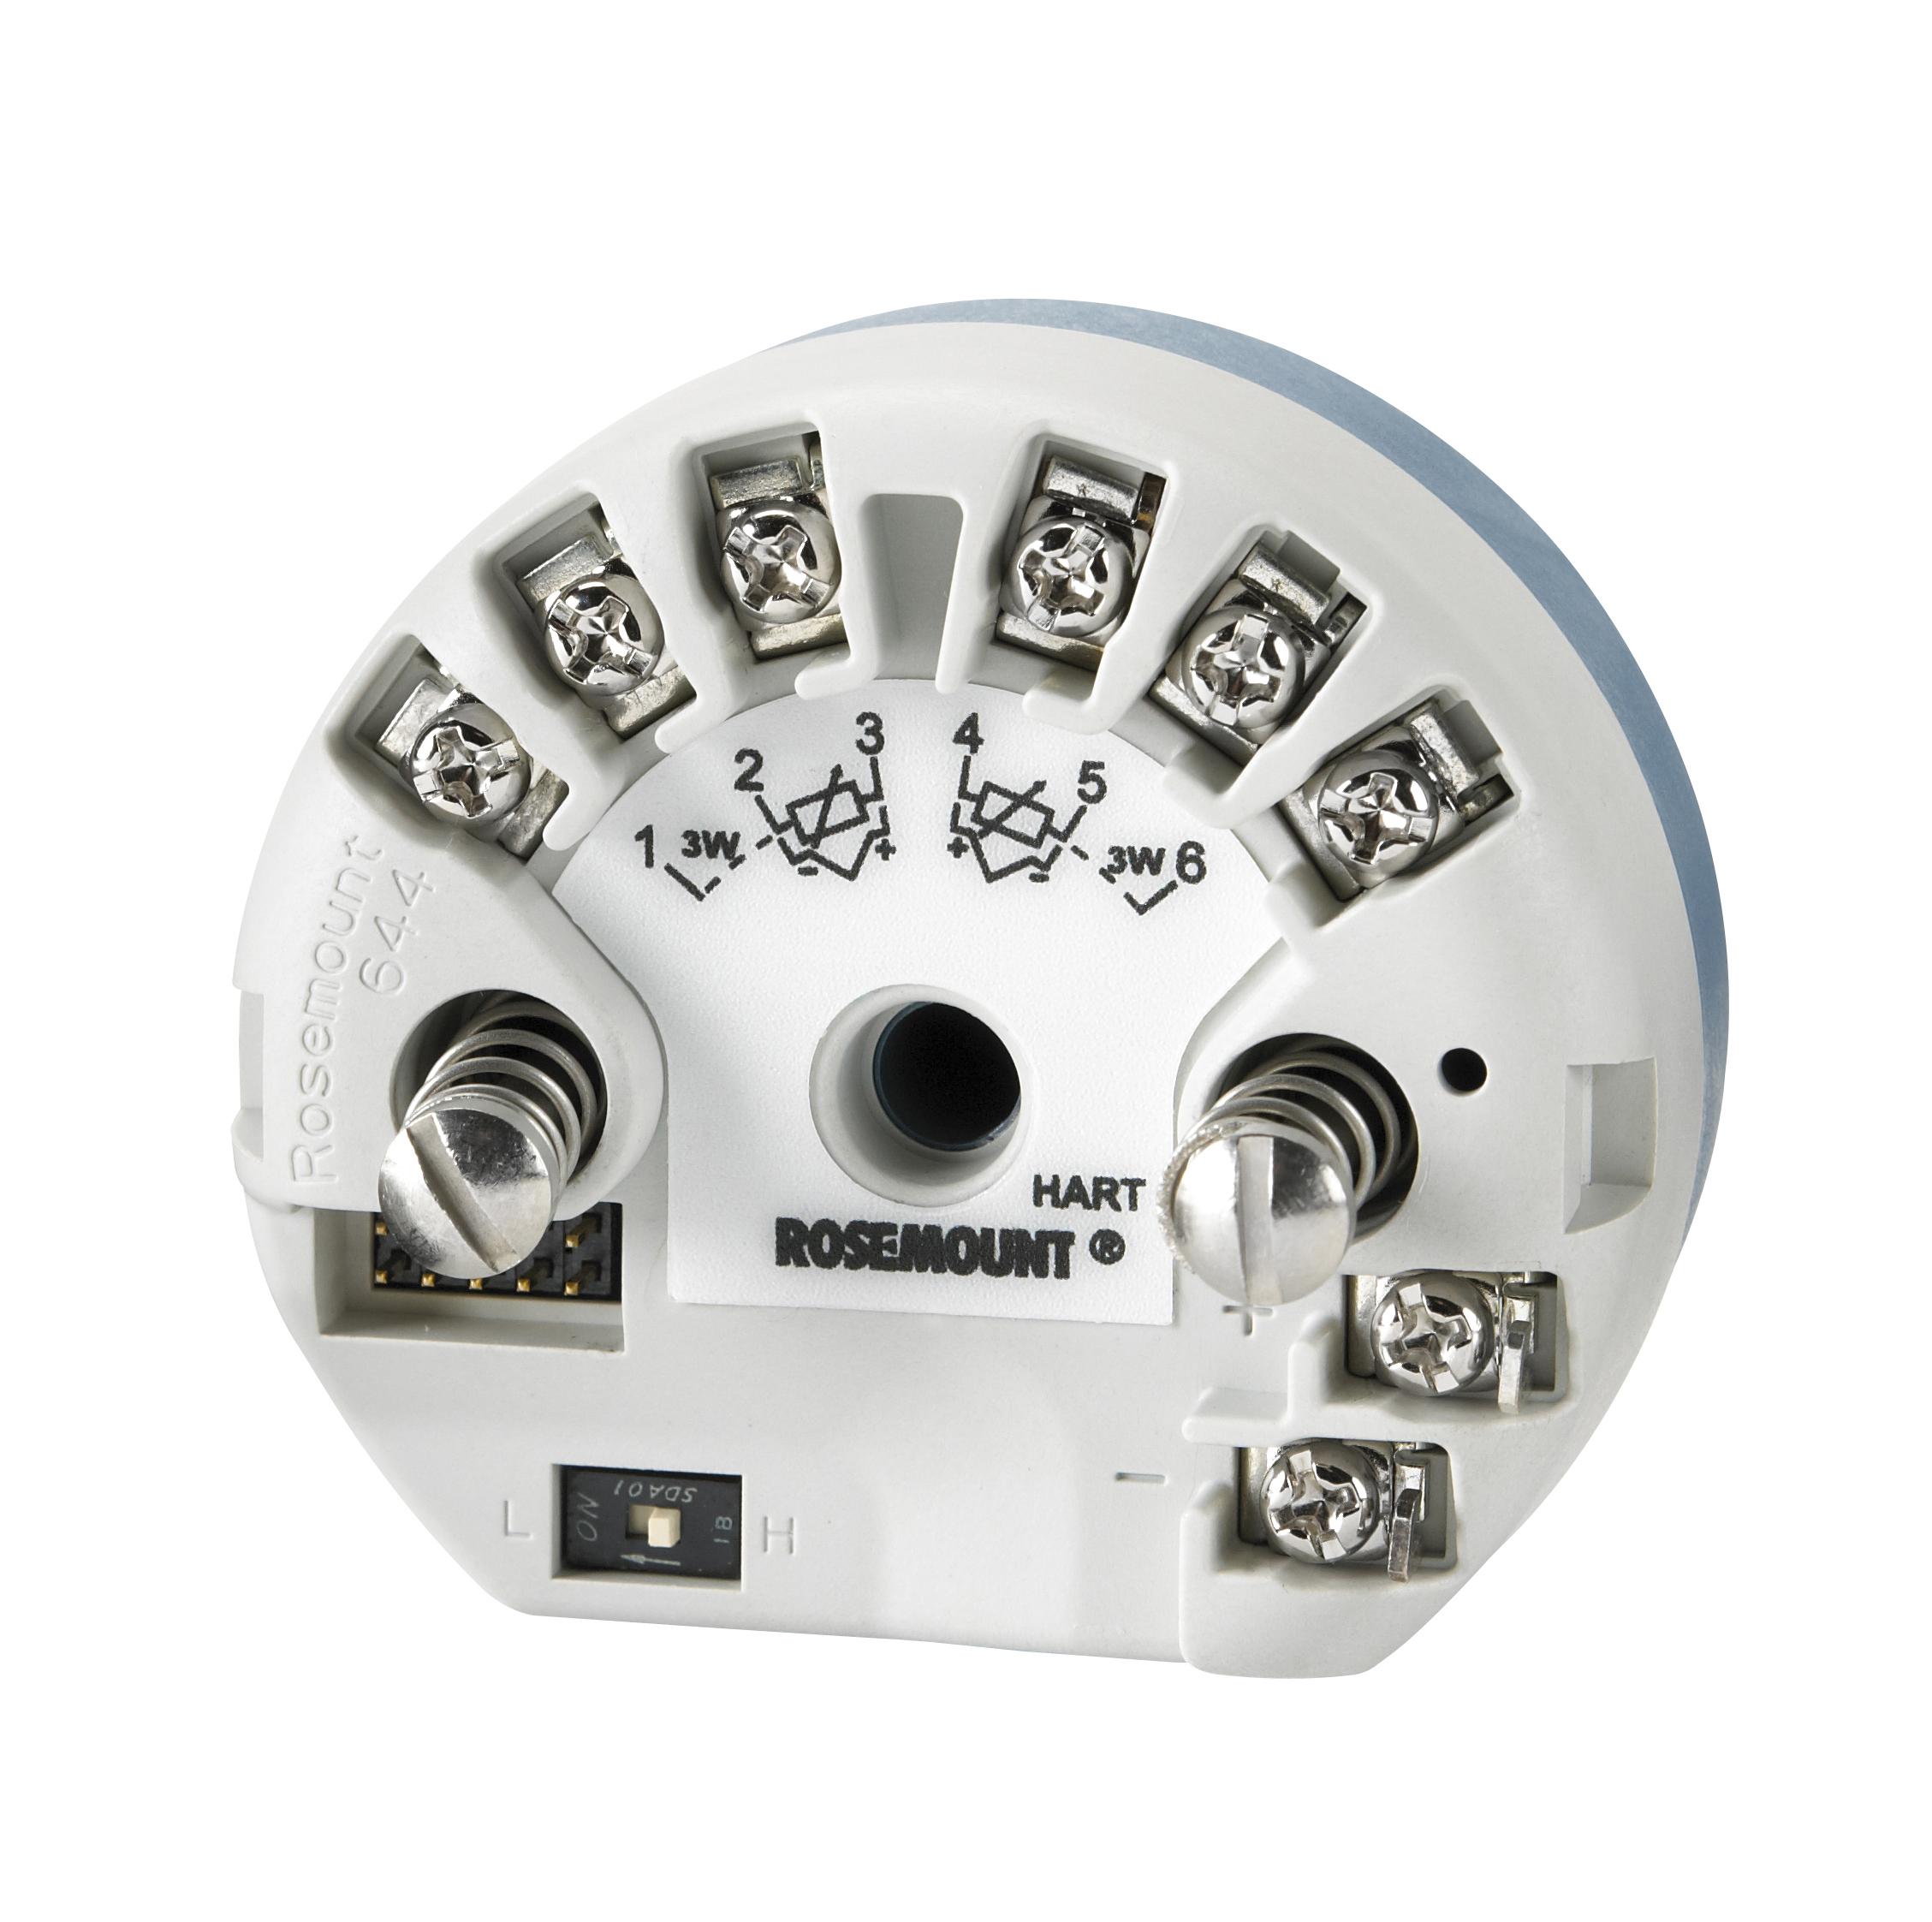 Rosemount 3144 Wiring Diagram And Schematics Hart 3144p Temperature Transmitter Visaya Source High Resolution Photo